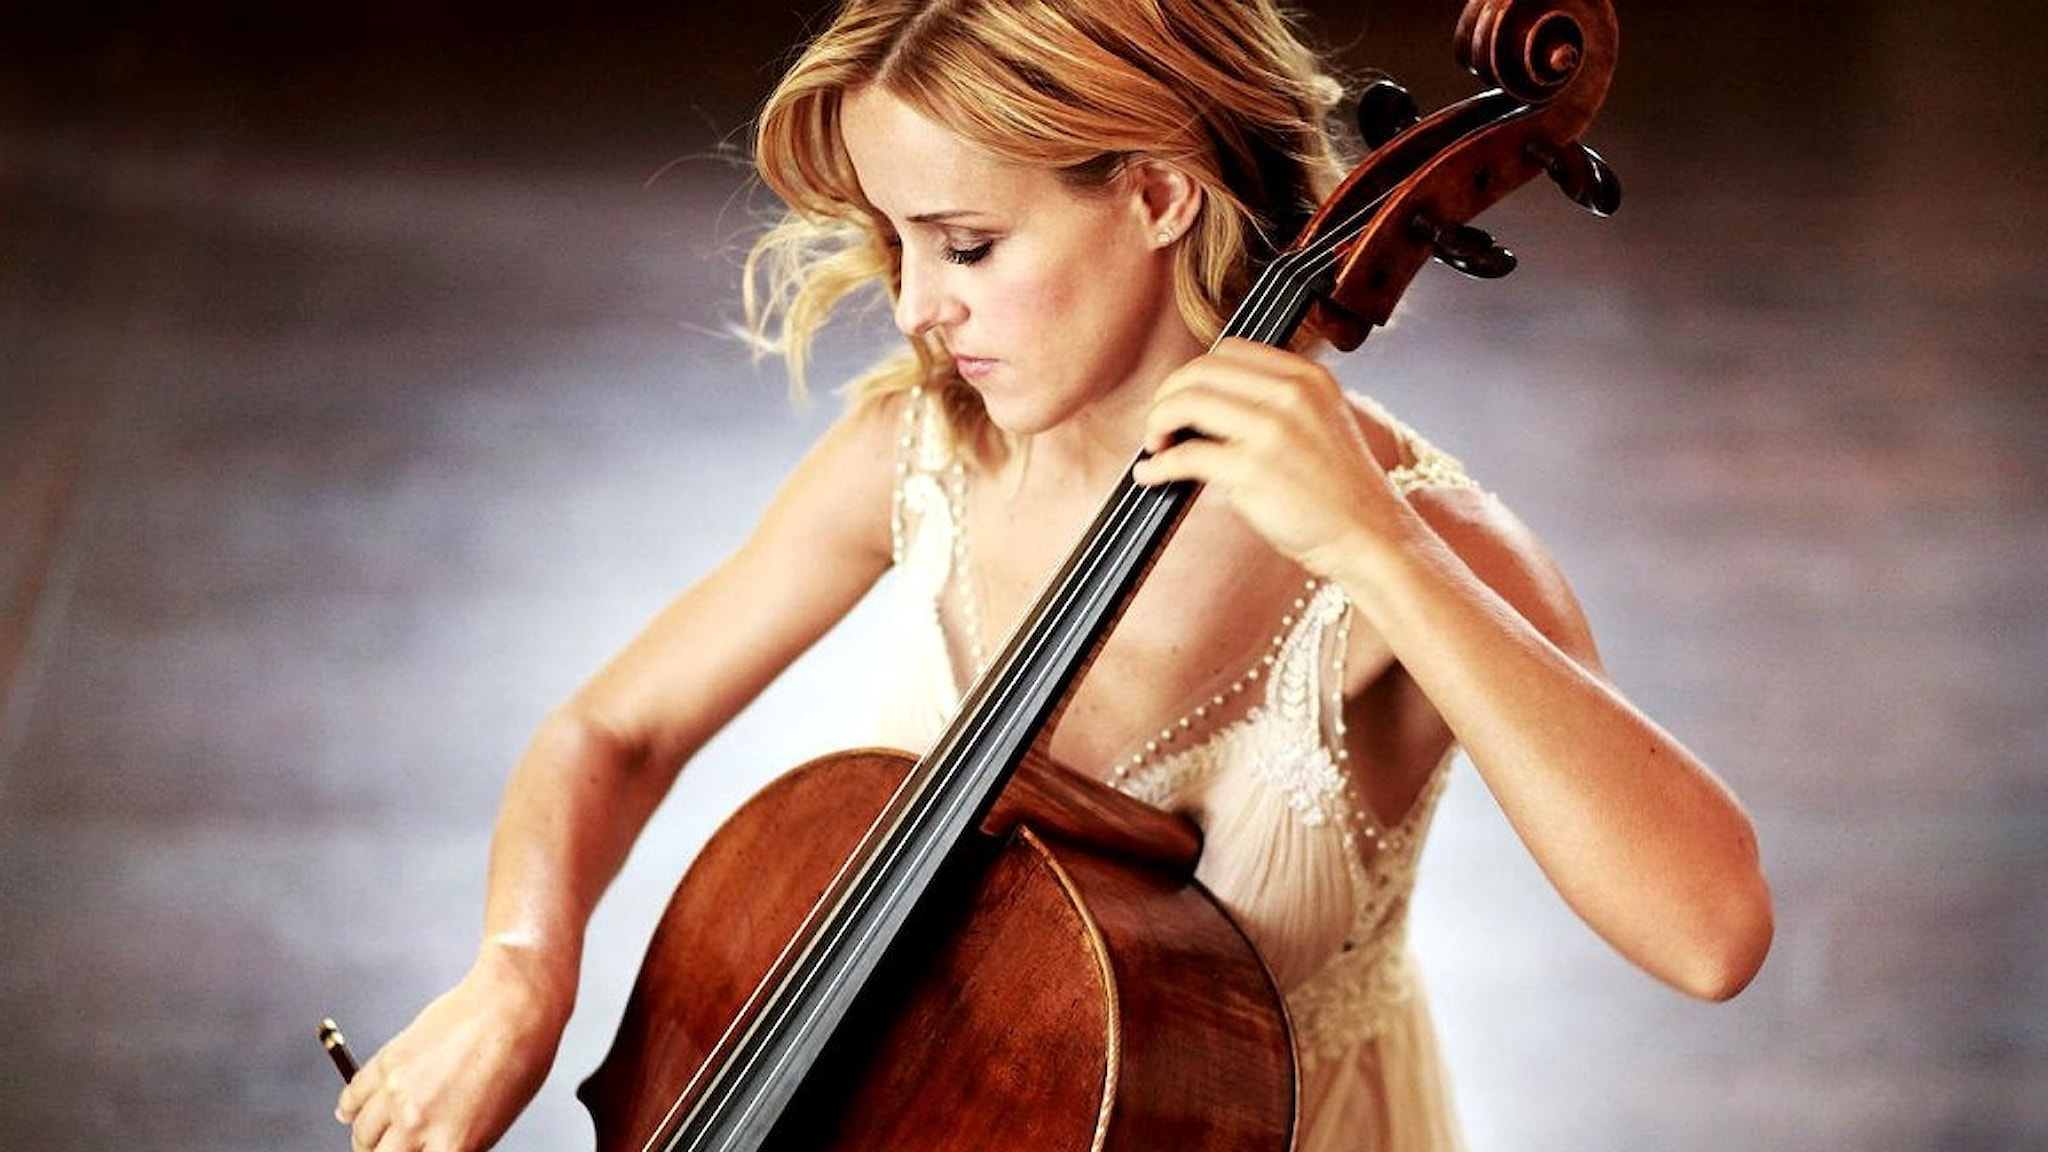 Den argentinska cellisten Sol Gabetta spelar Camille Saint-Saëns virtuosa cellokonsert i d-moll.